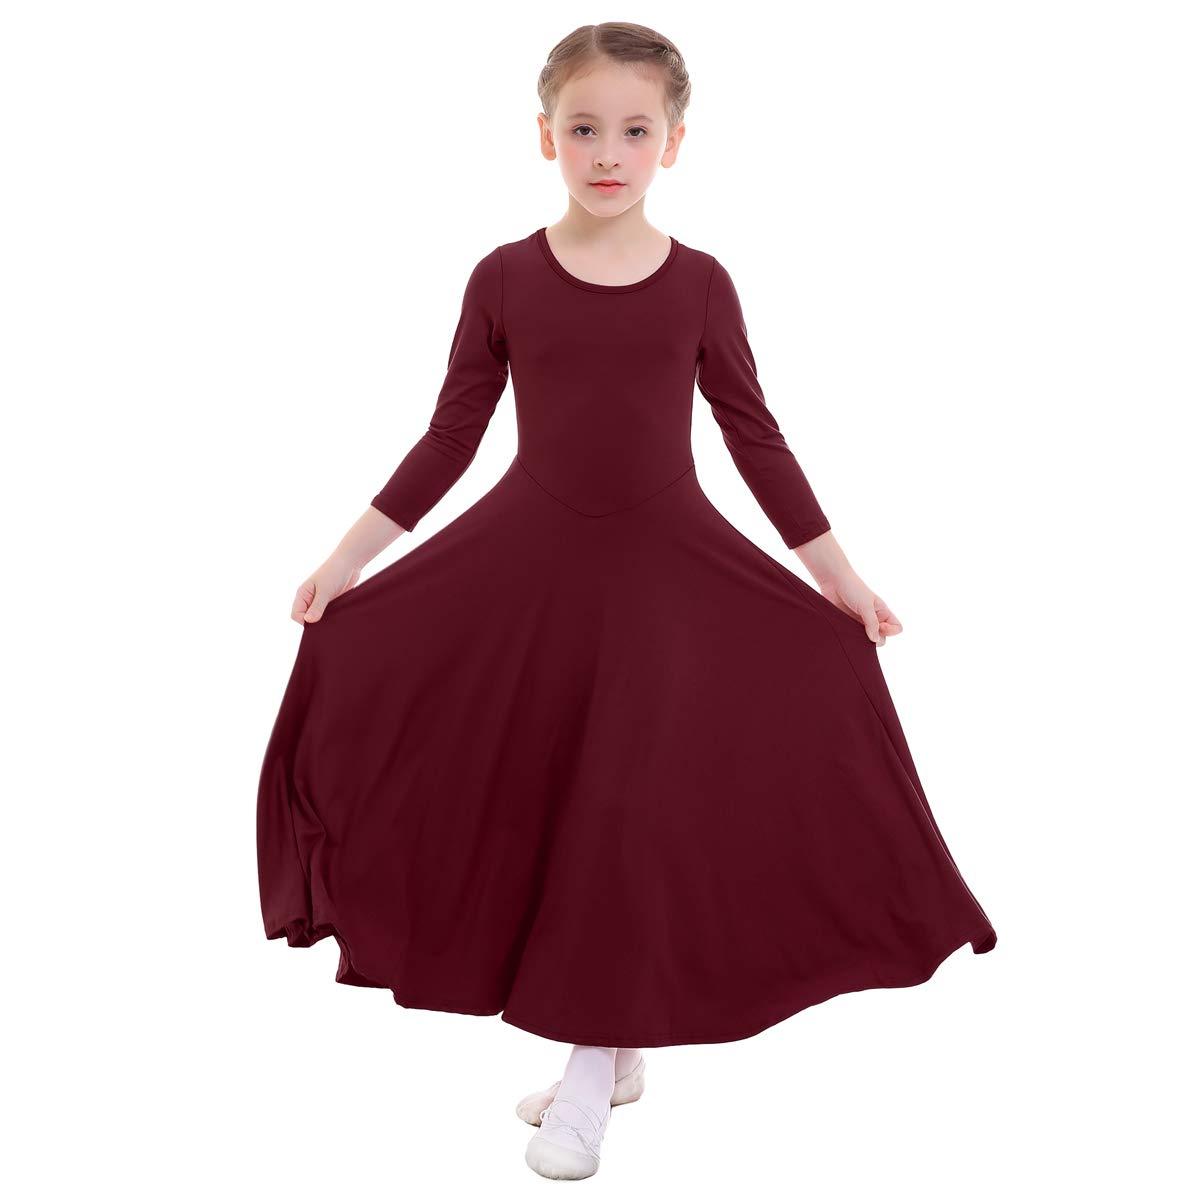 OwlFay Girls Praise Dance Dress Liturgical Full Lengh Skirts Long Maxi Gown